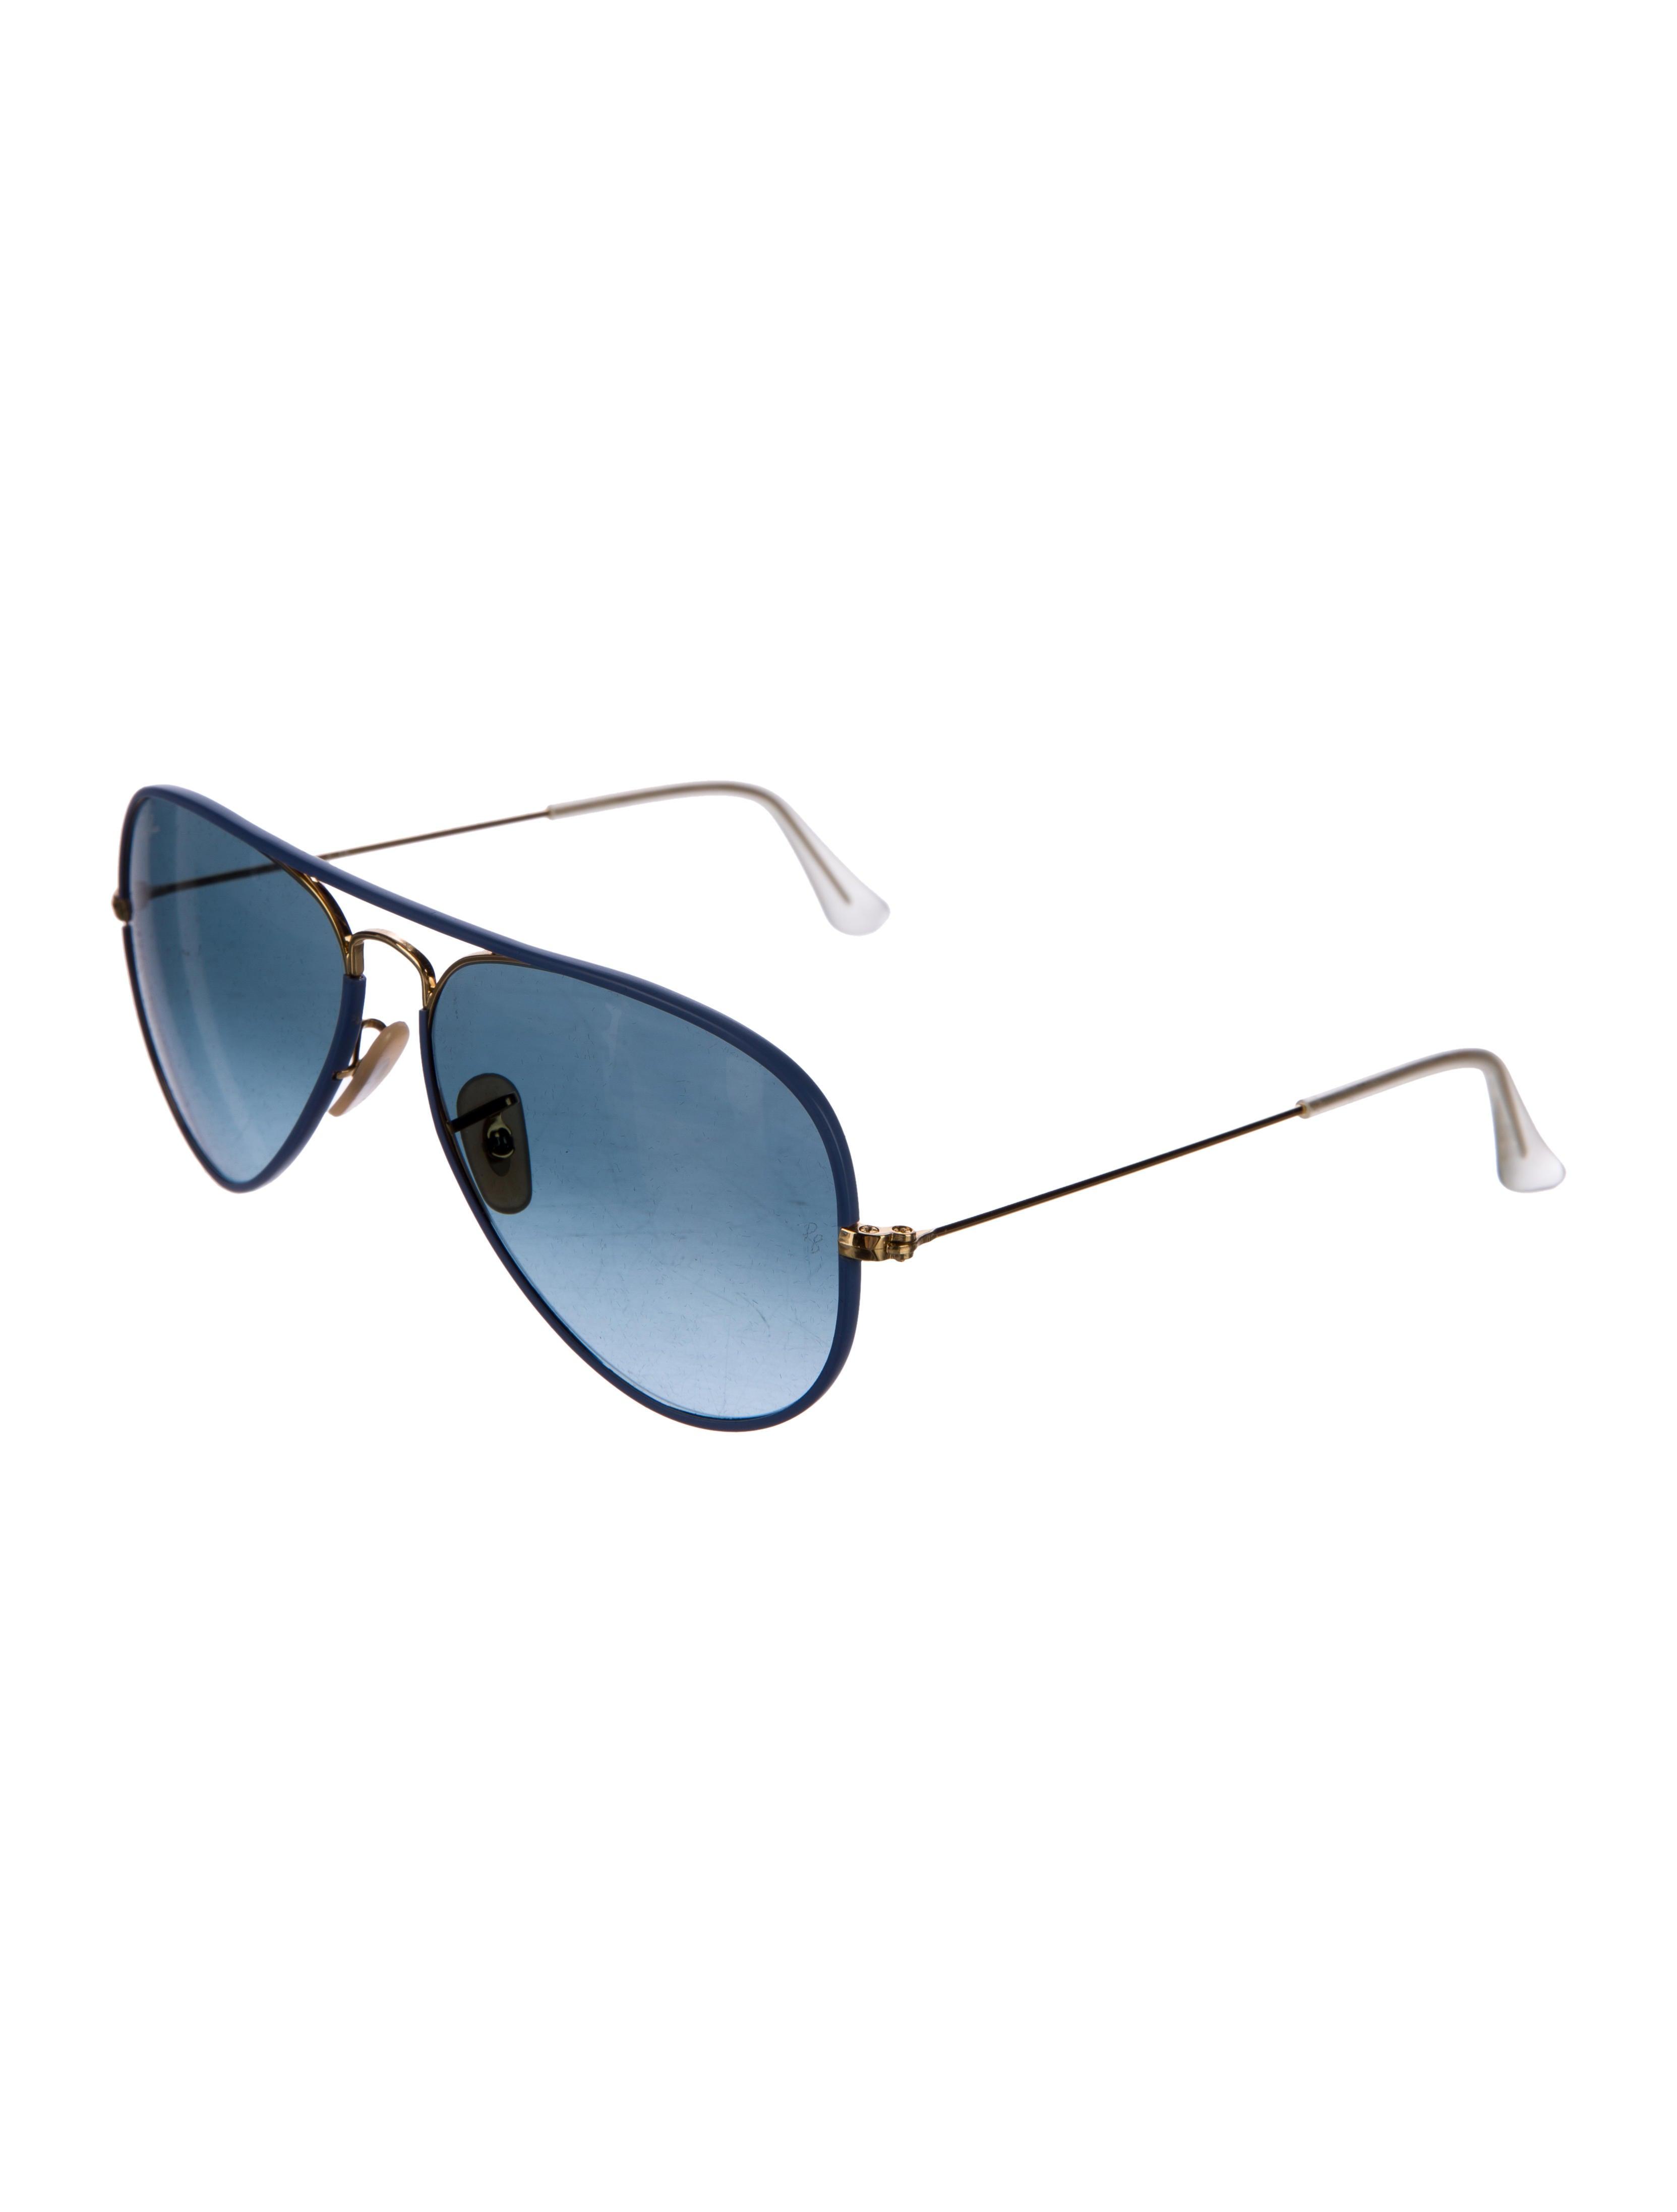 Ray-Ban Aviator Full Color Sunglasses - Accessories - WRX25703   The  RealReal 95a9eb2abc